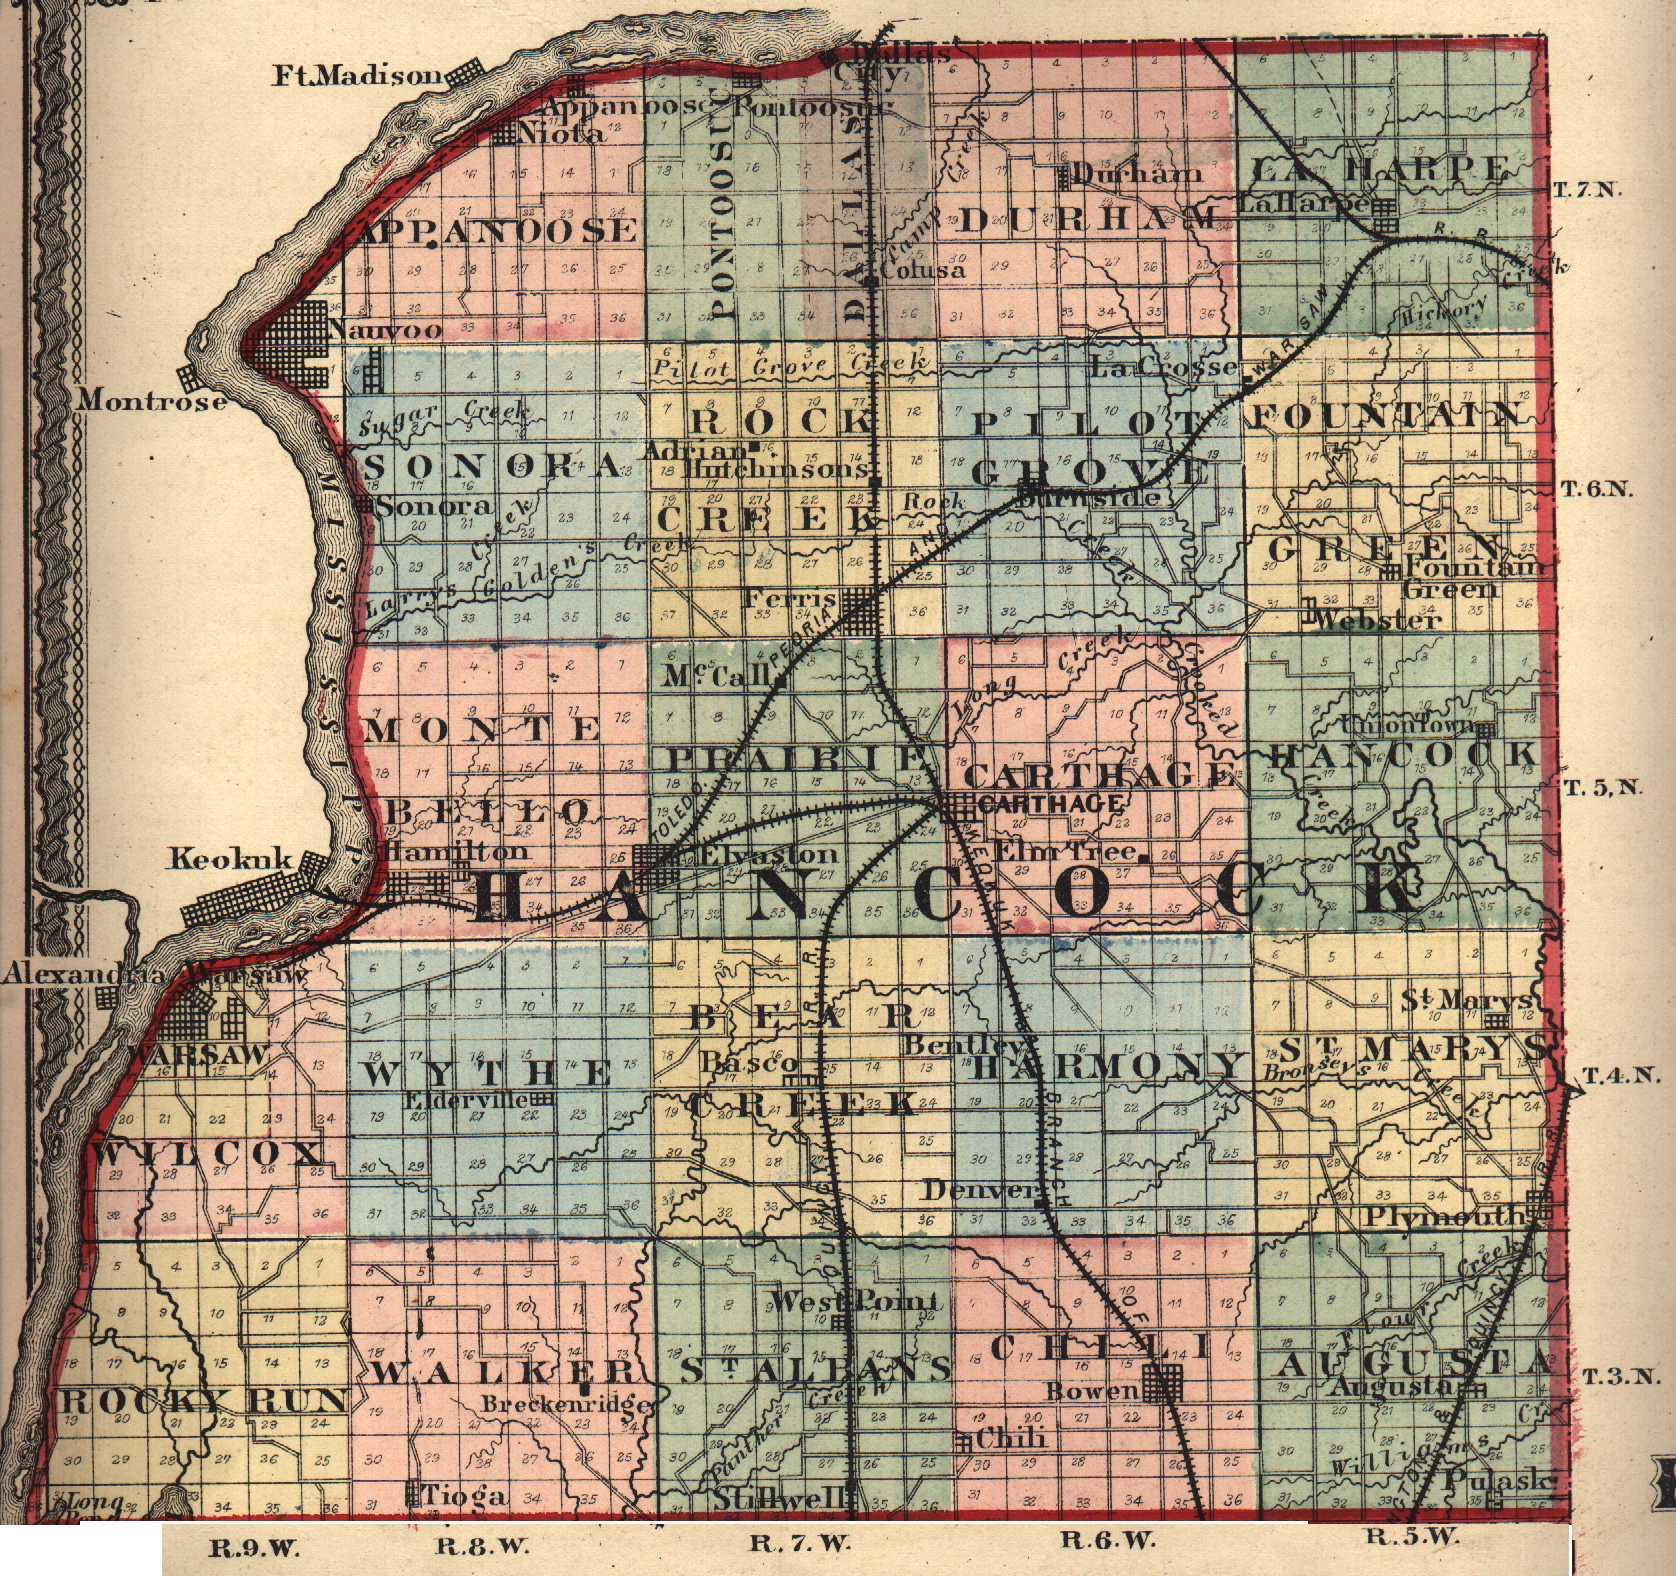 Illinois hancock county elvaston - 7 5 Minute Topographic Maps In Hancock County Identifies Cemeteries City Town Directory Source Usgenweb Illinois Archives